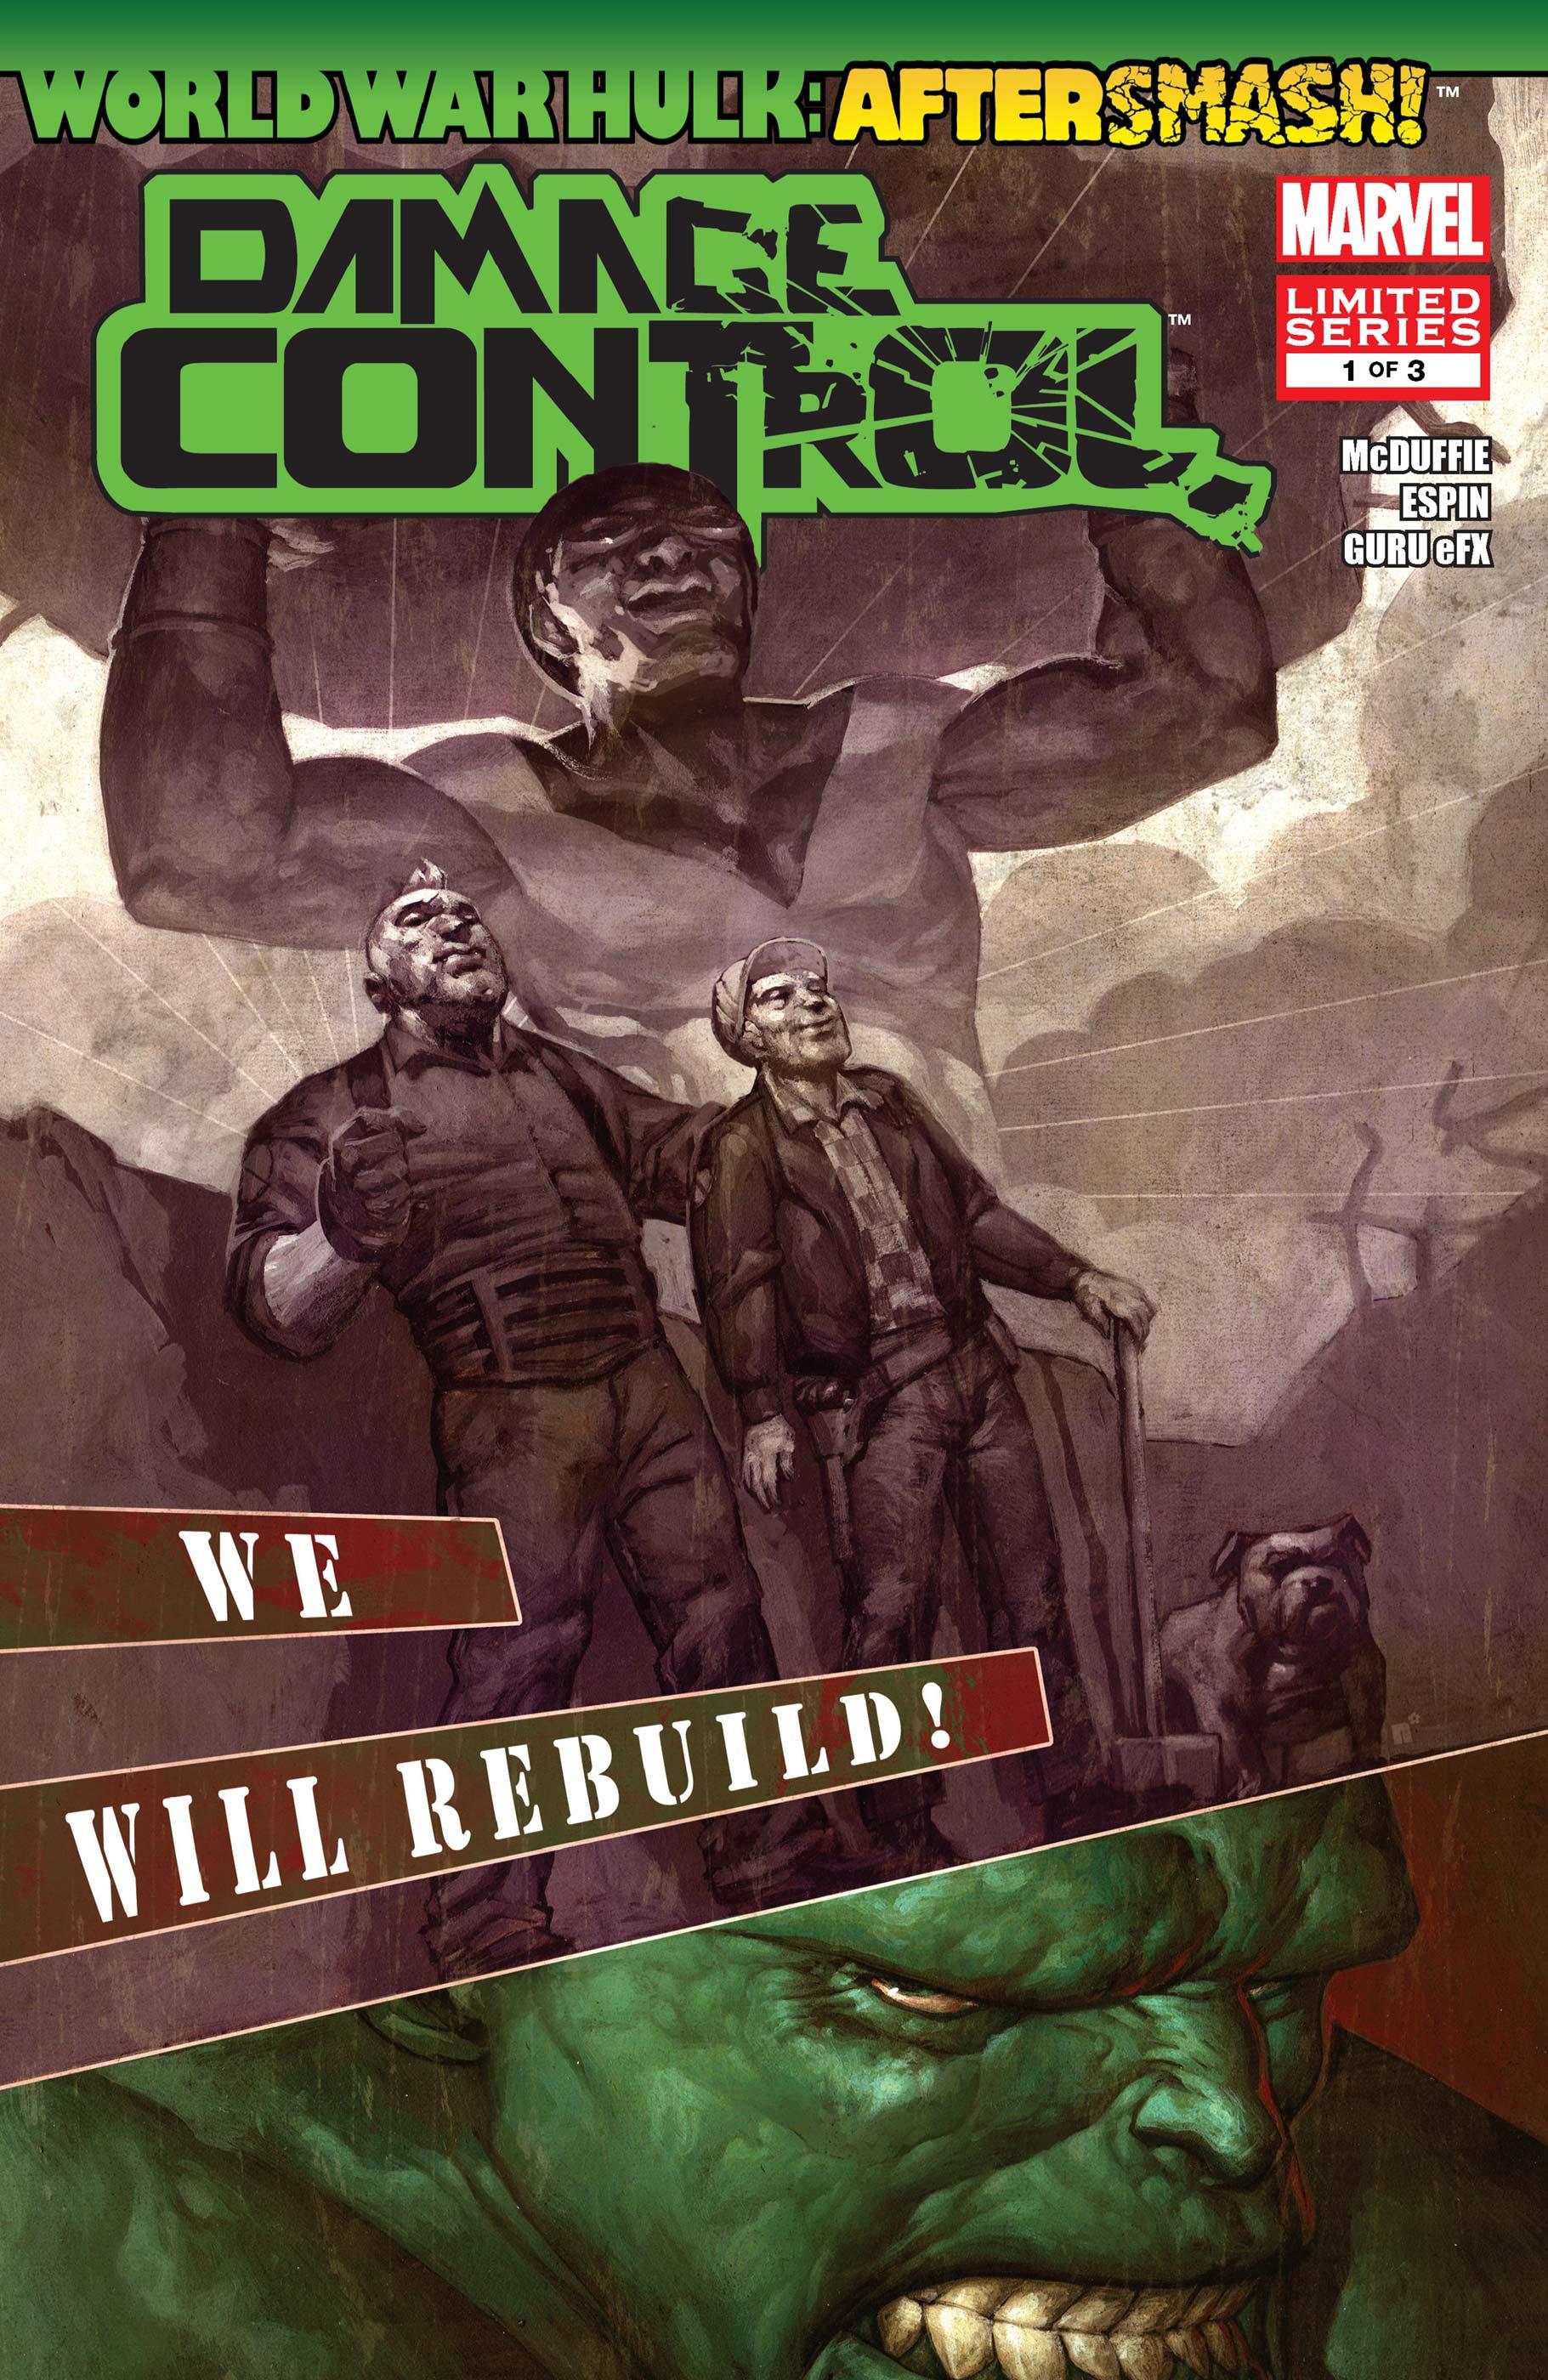 World War Hulk: Aftersmash! - Damage Control (2008) #1